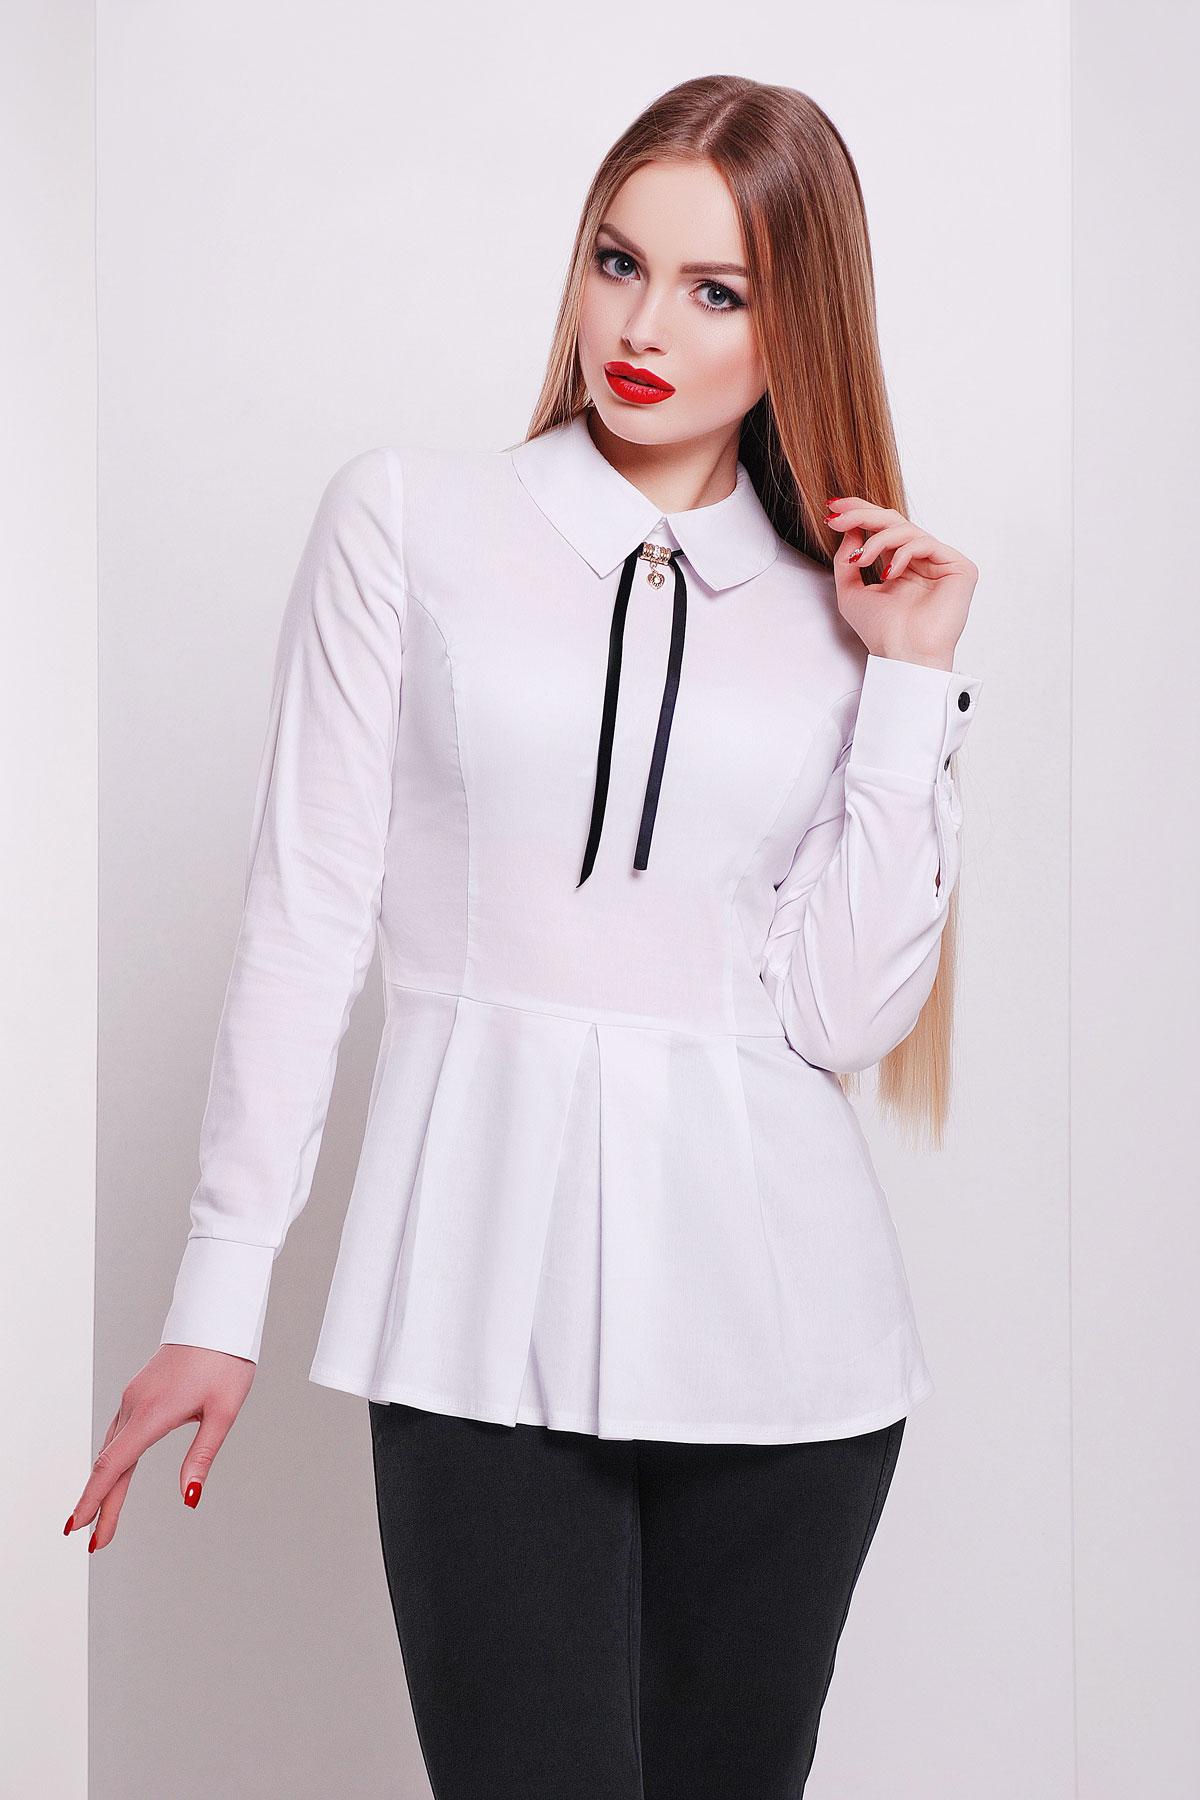 c81b03076a1 белая блузка для офиса. блуза Бергамо д р. Цвет  белый